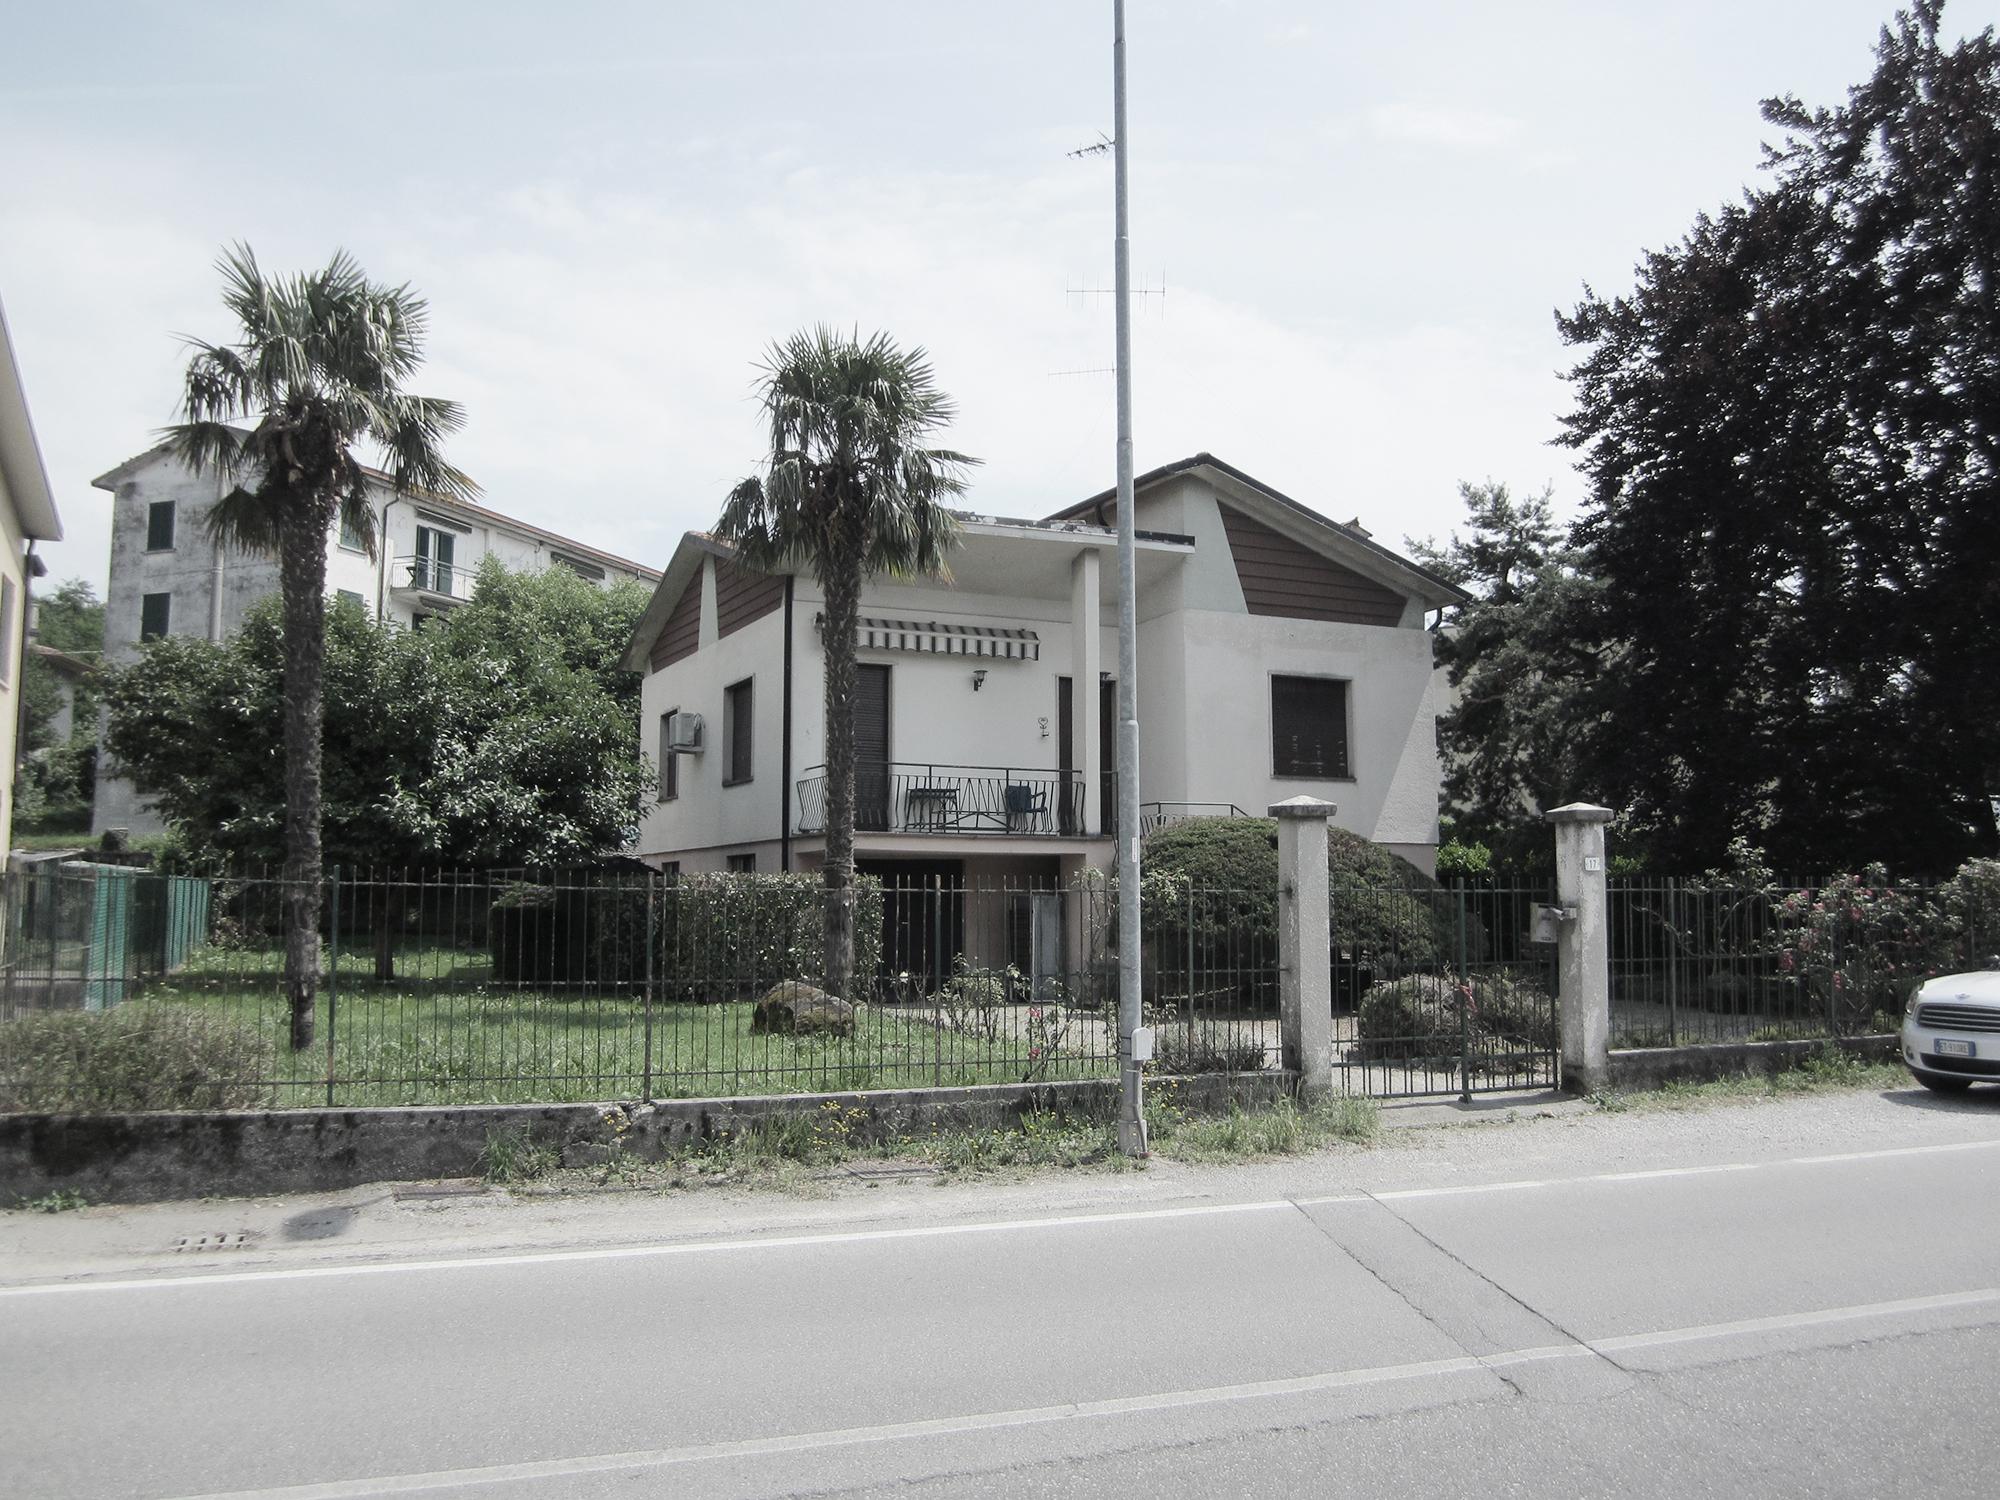 umberto_mauri_architetto_mauri_studio_lago_pusiano_como_bosisio_parini_private_renovation_house_residential_2000_01